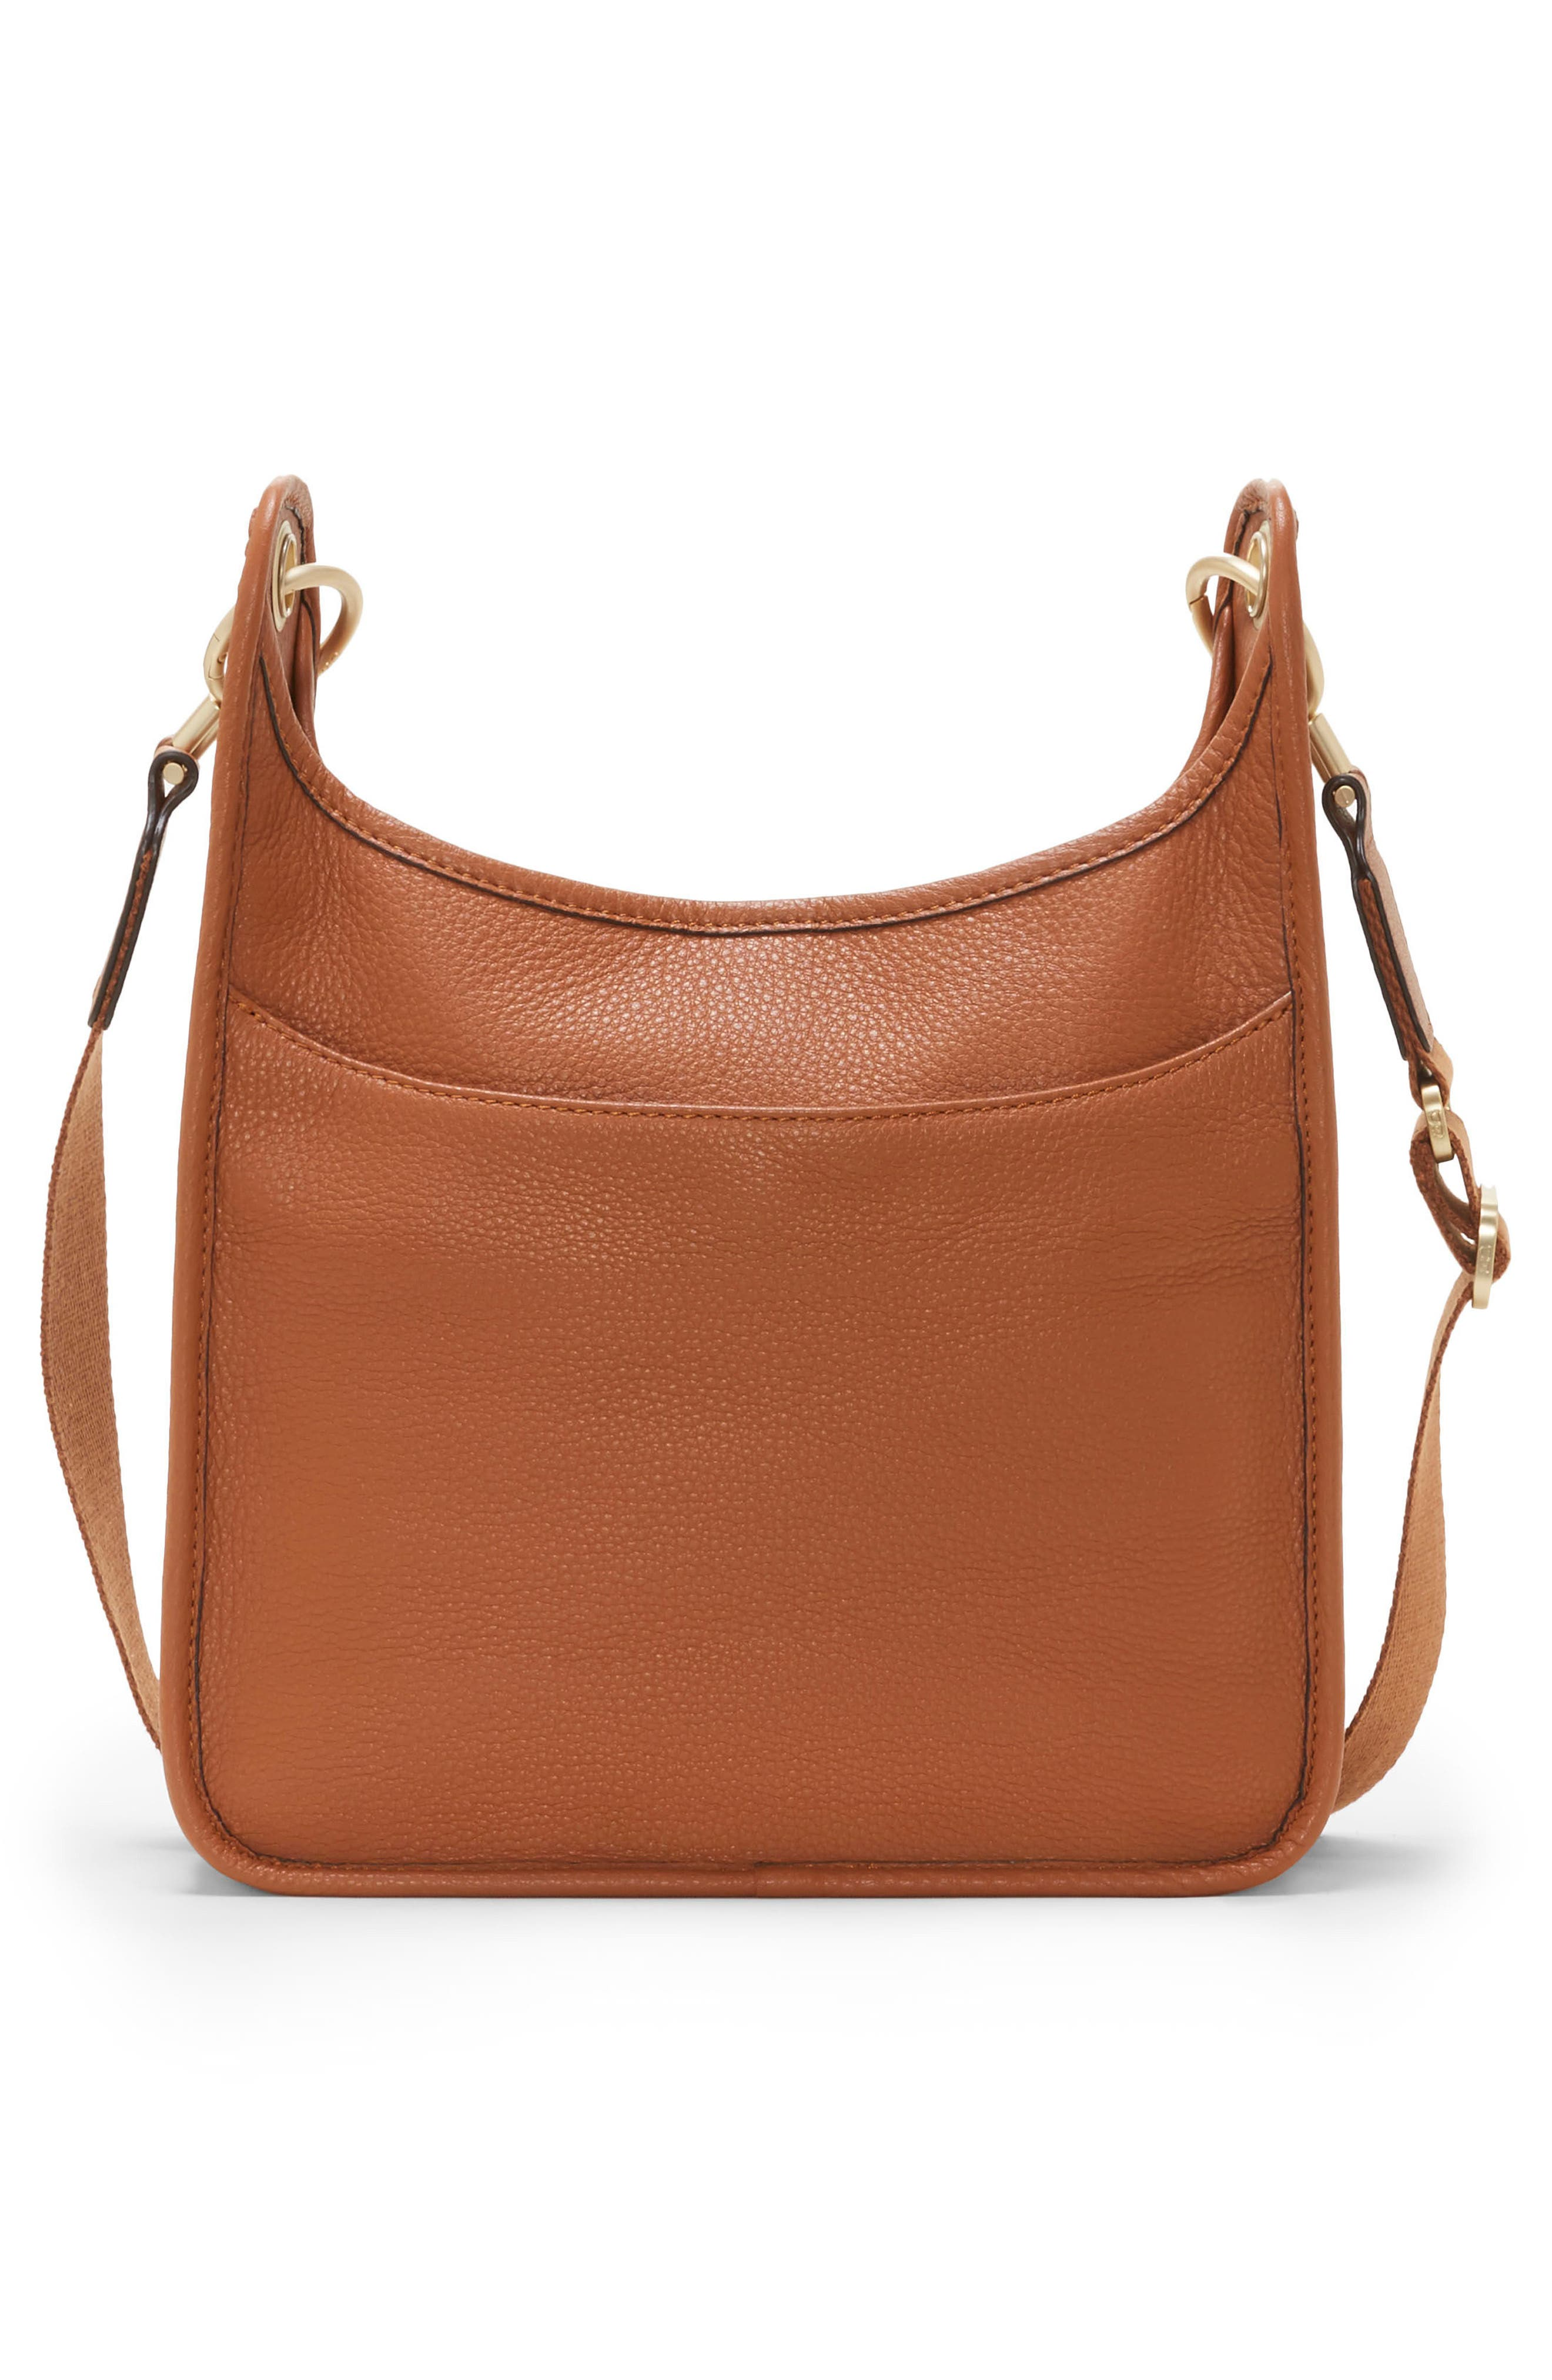 Leather Crossbody Bag,                             Alternate thumbnail 2, color,                             201